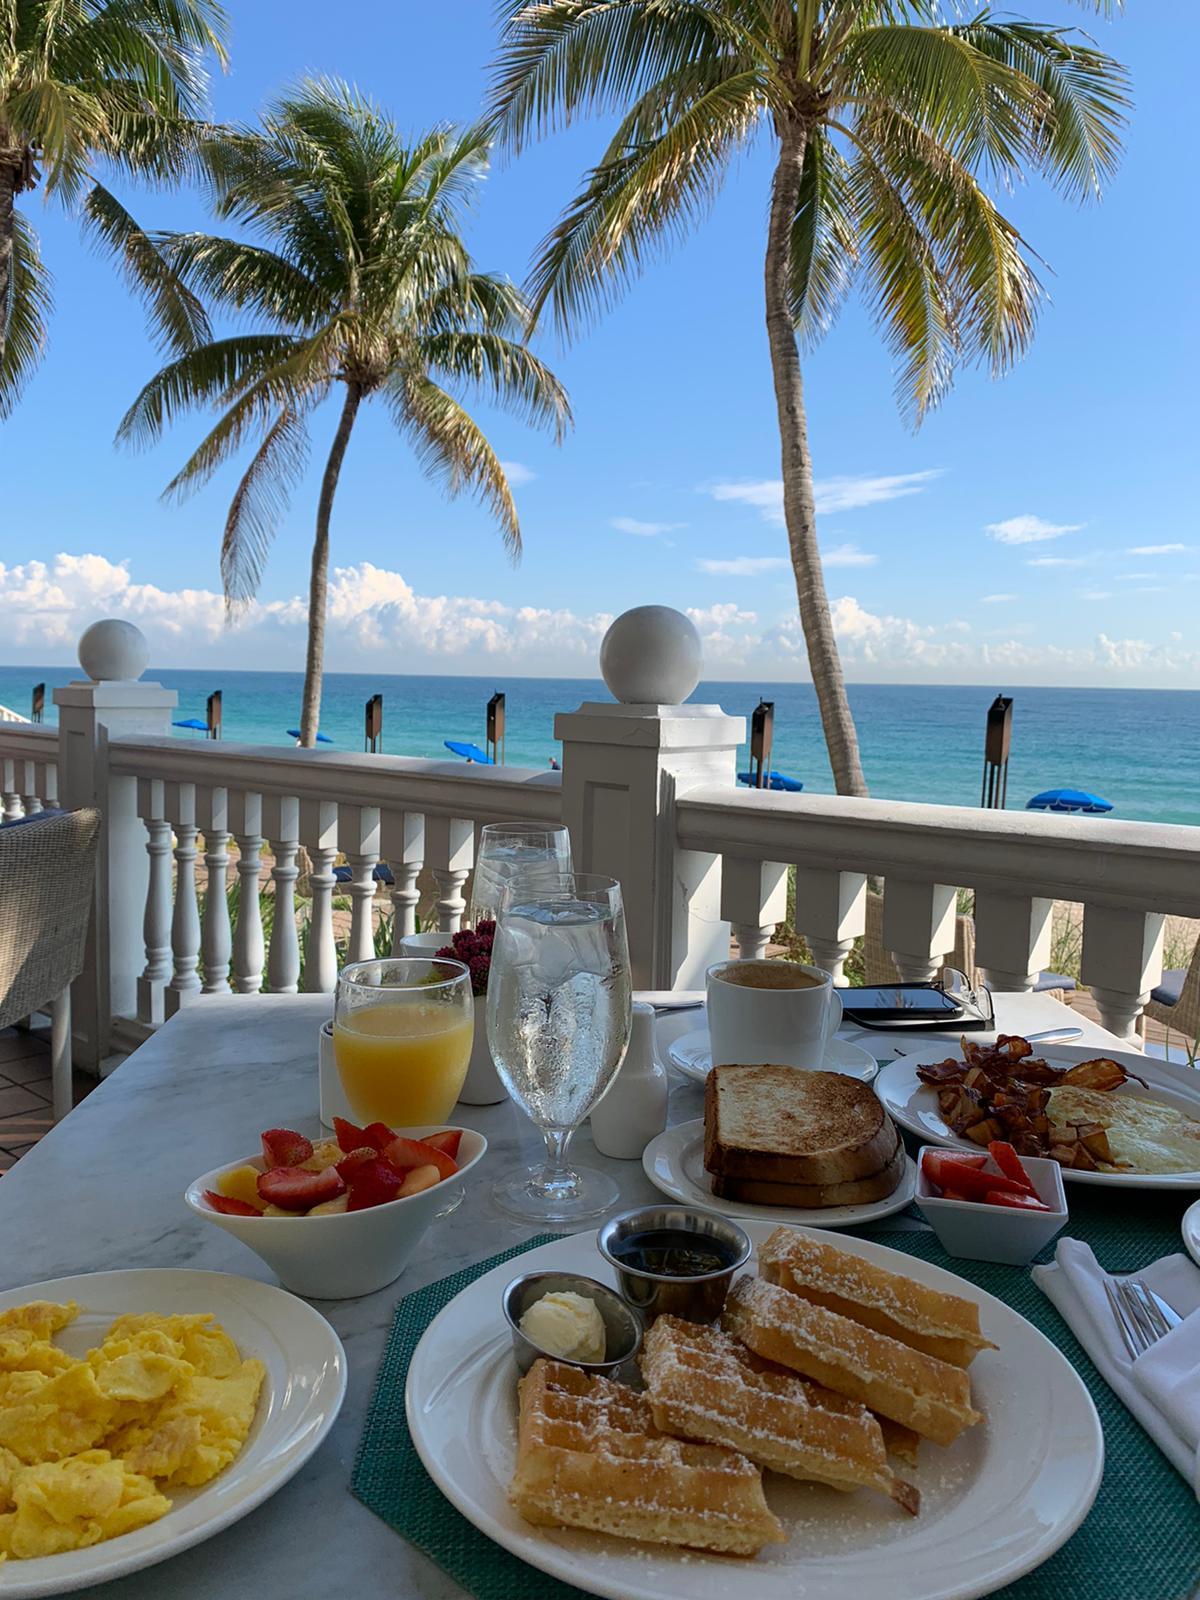 Breakfast at the Pelican Grand Beach Resort